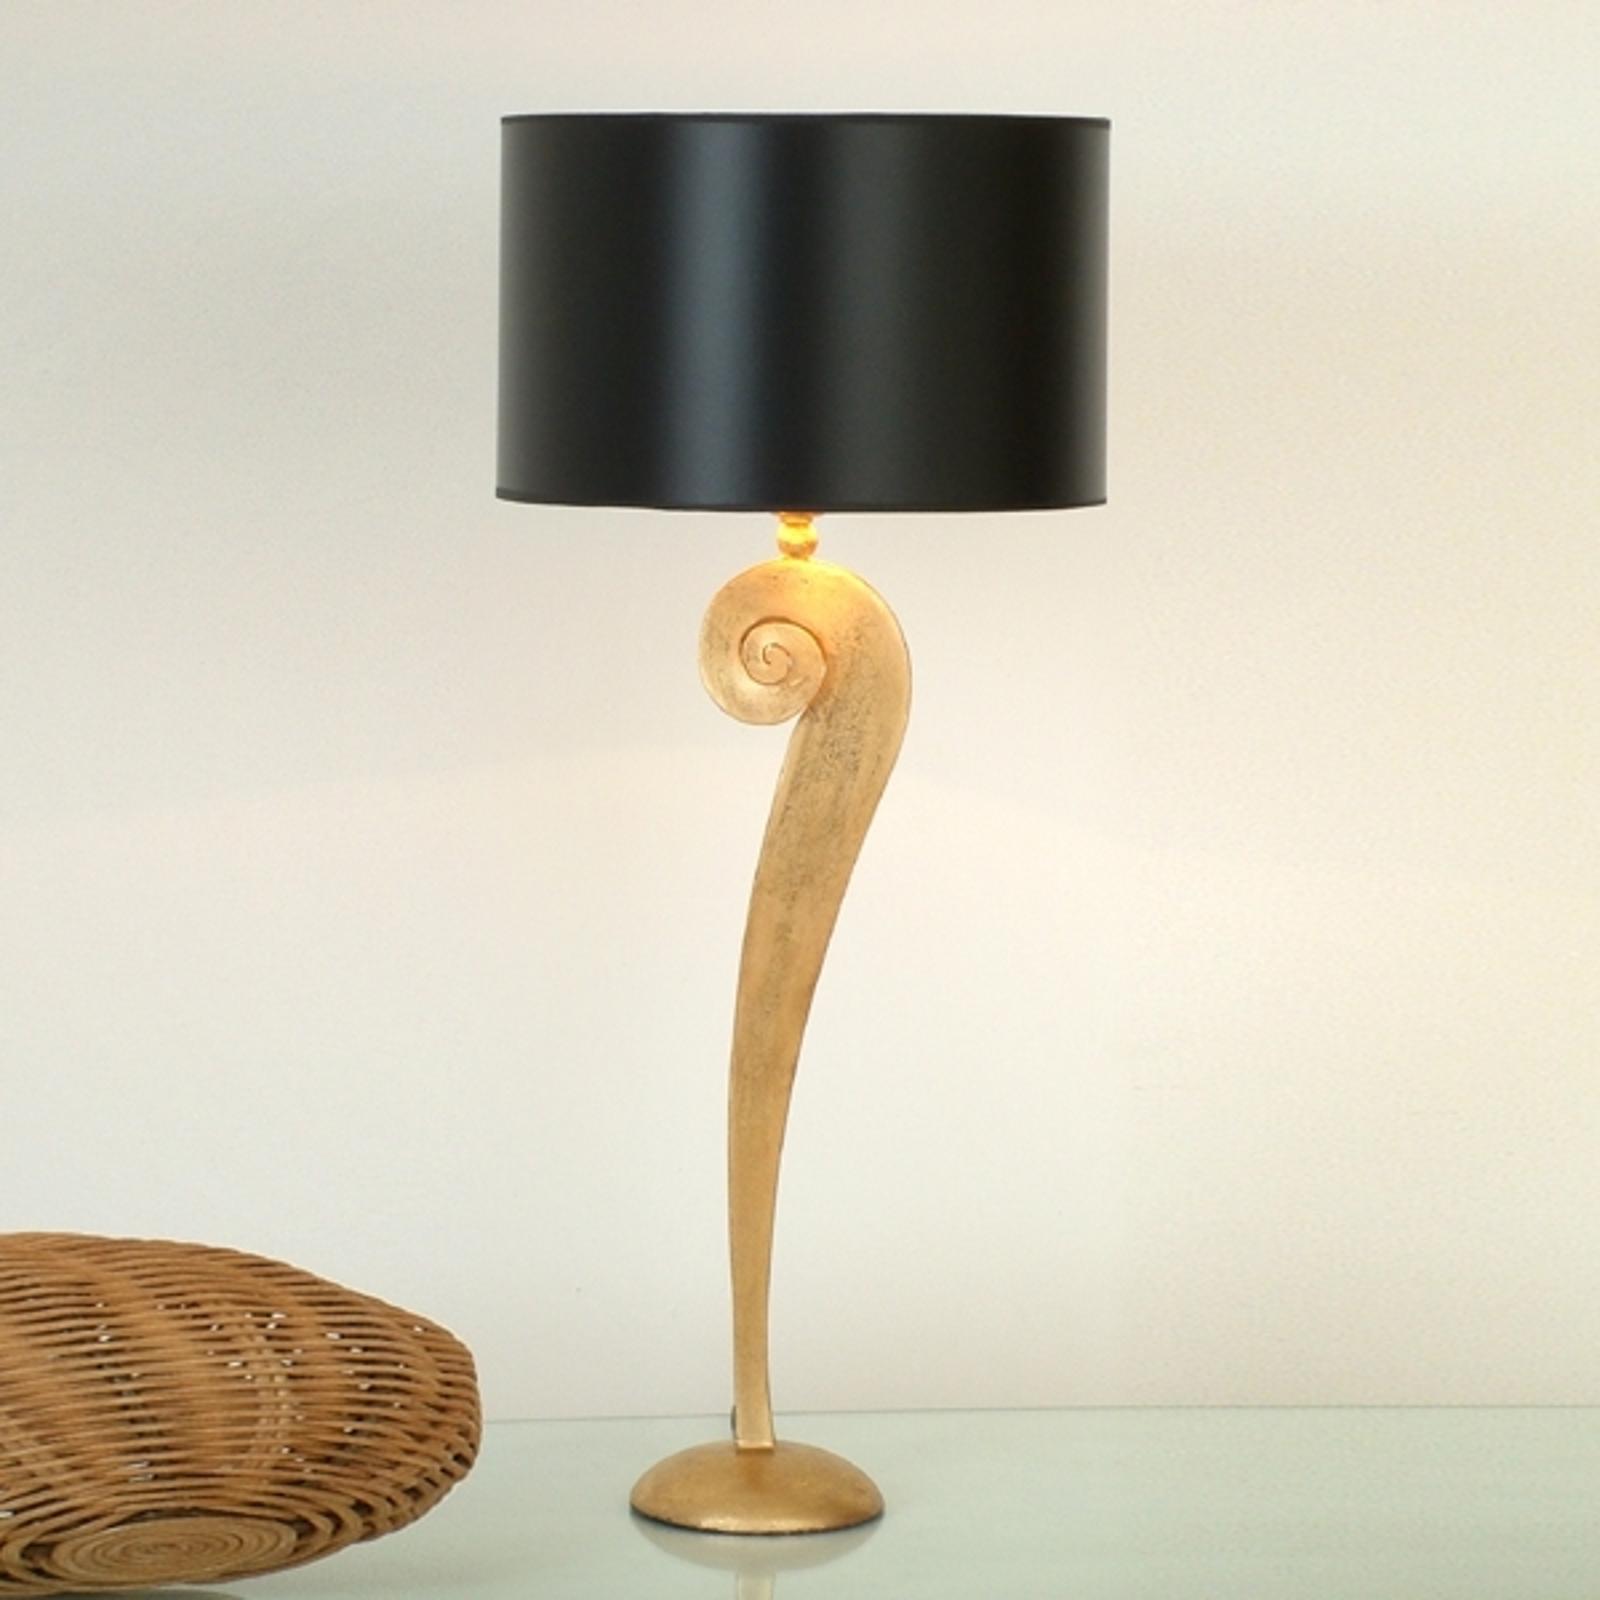 Fraaie tafellamp LORGOLIOSO goud-zwart